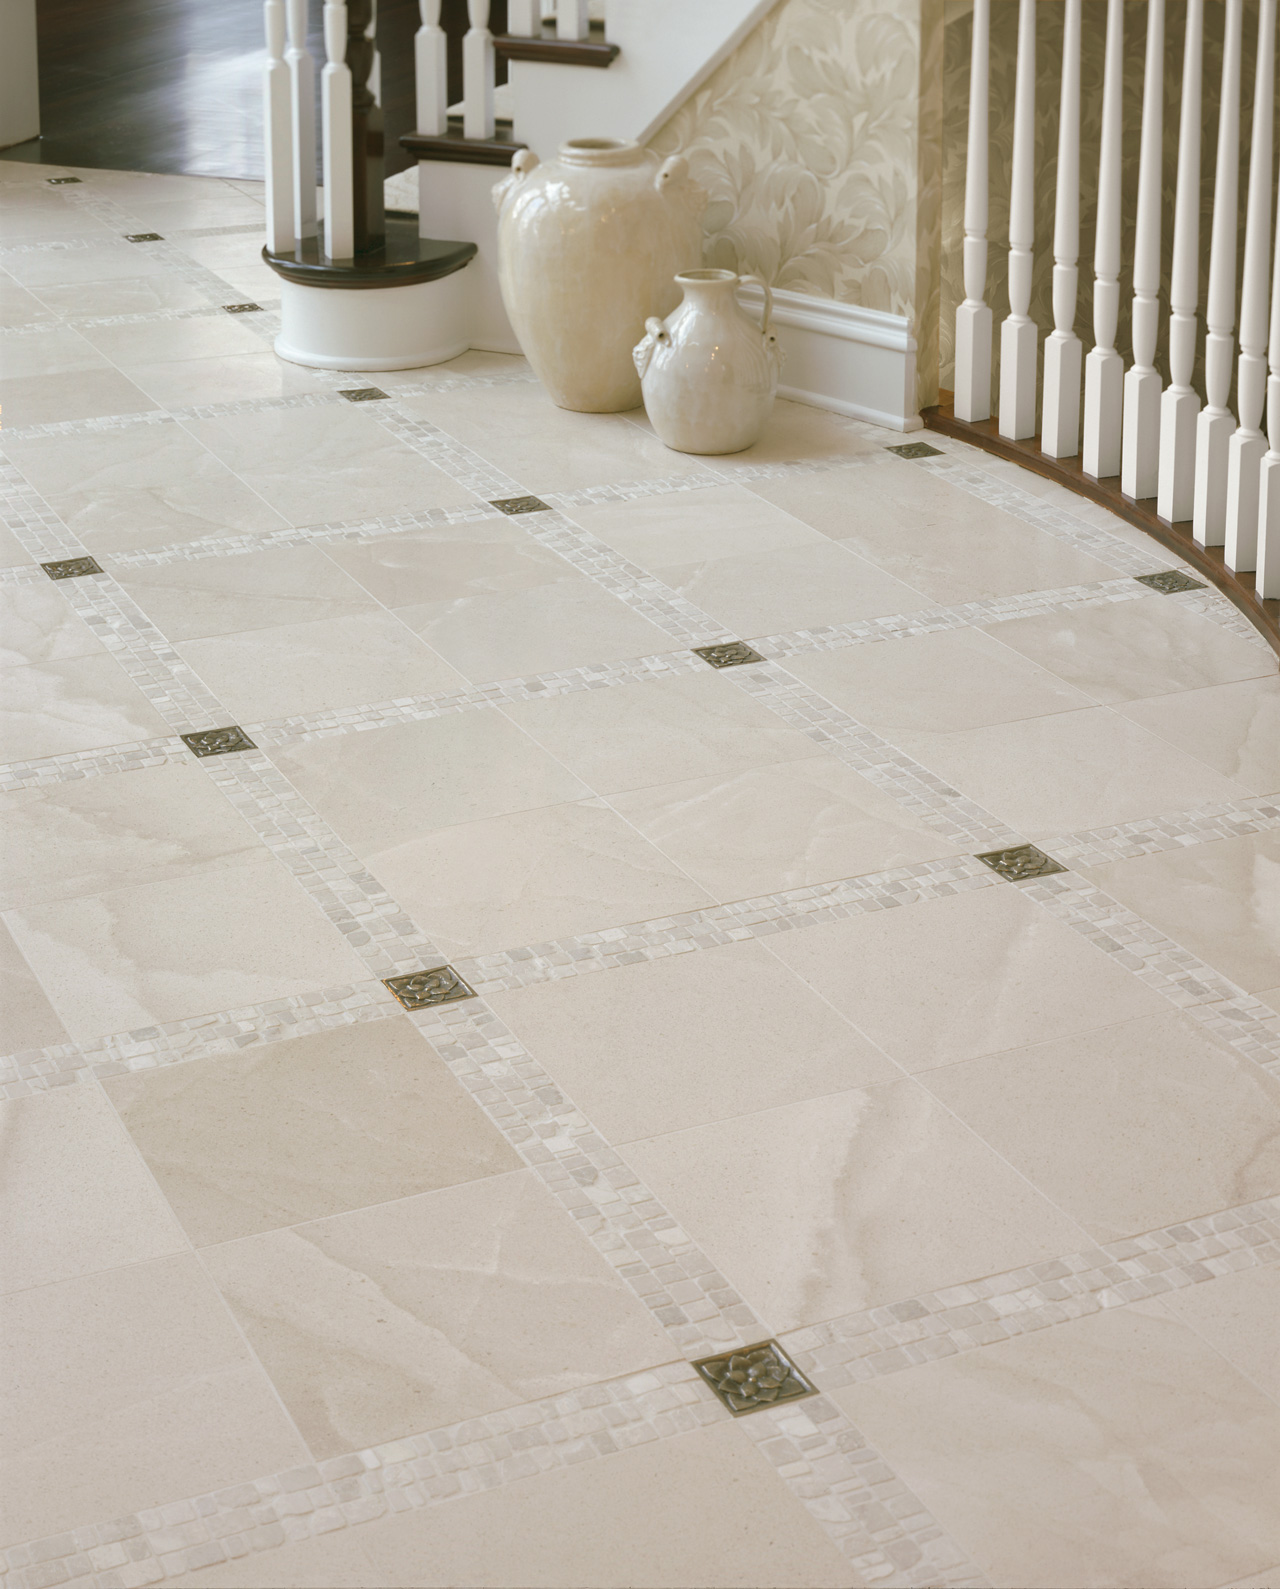 Floor Accents: Metal Accent Tiles - Foundry Art